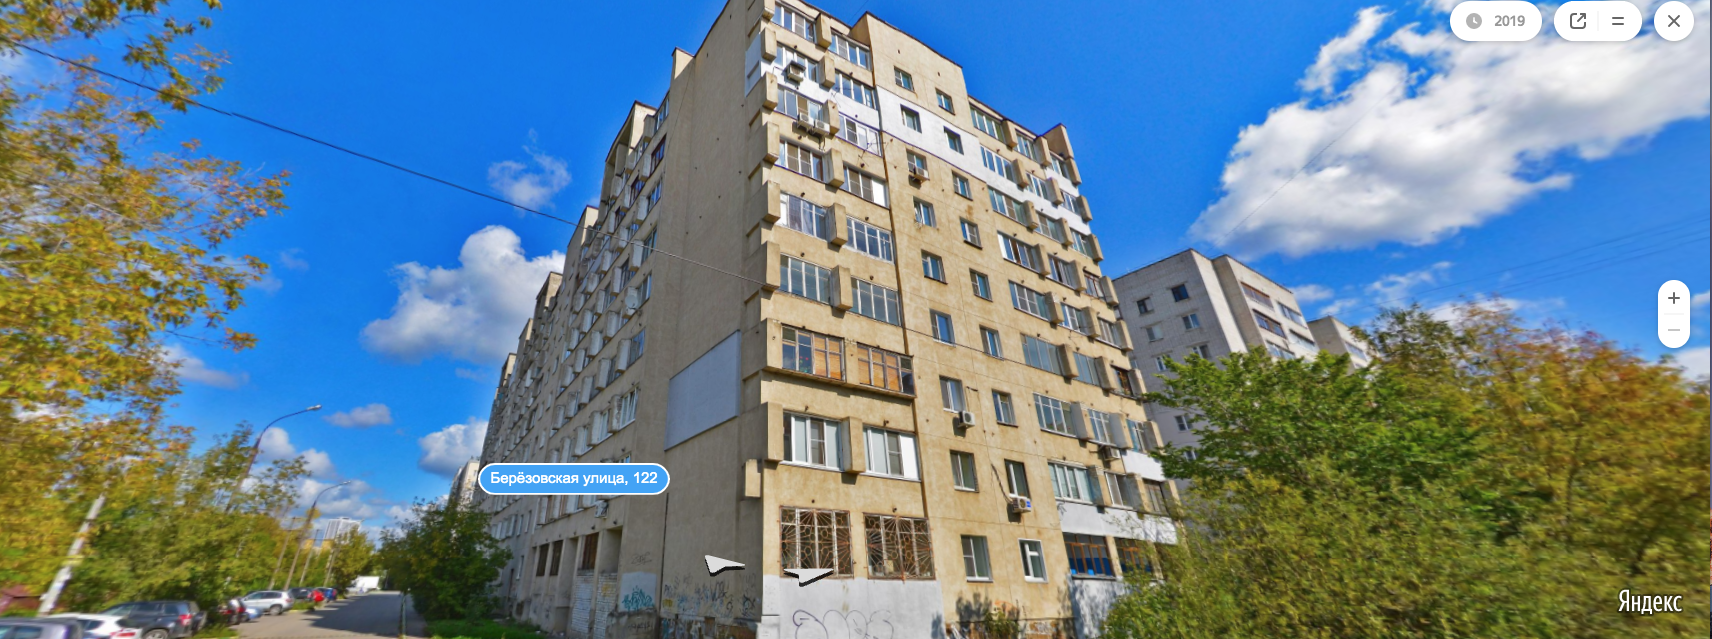 "Фото © ""Яндекс"". Дом, где живёт Кондратьев"